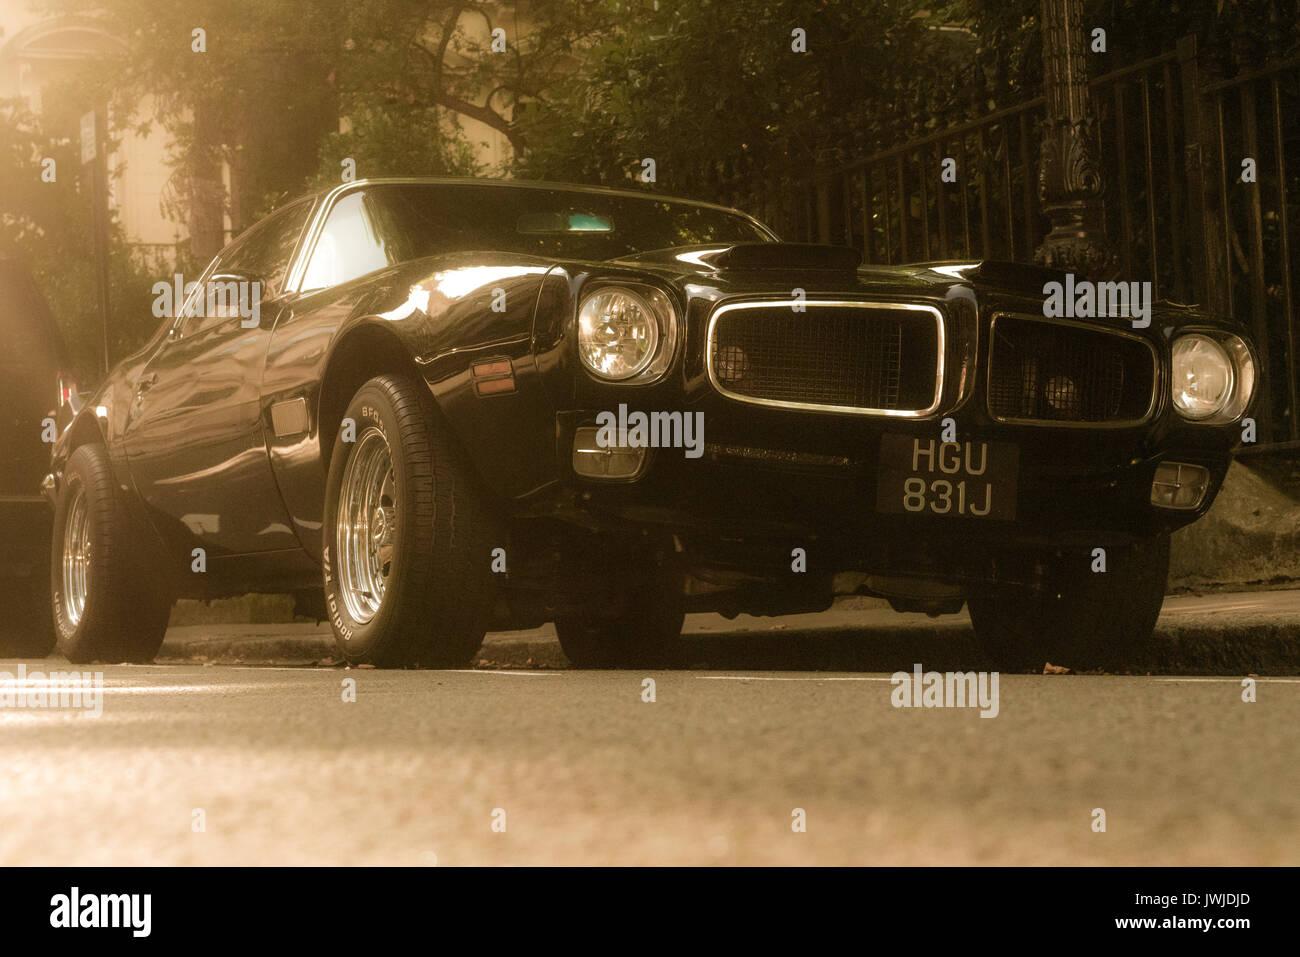 Car Decal Stockfotos Amp Car Decal Bilder Seite 2 Alamy